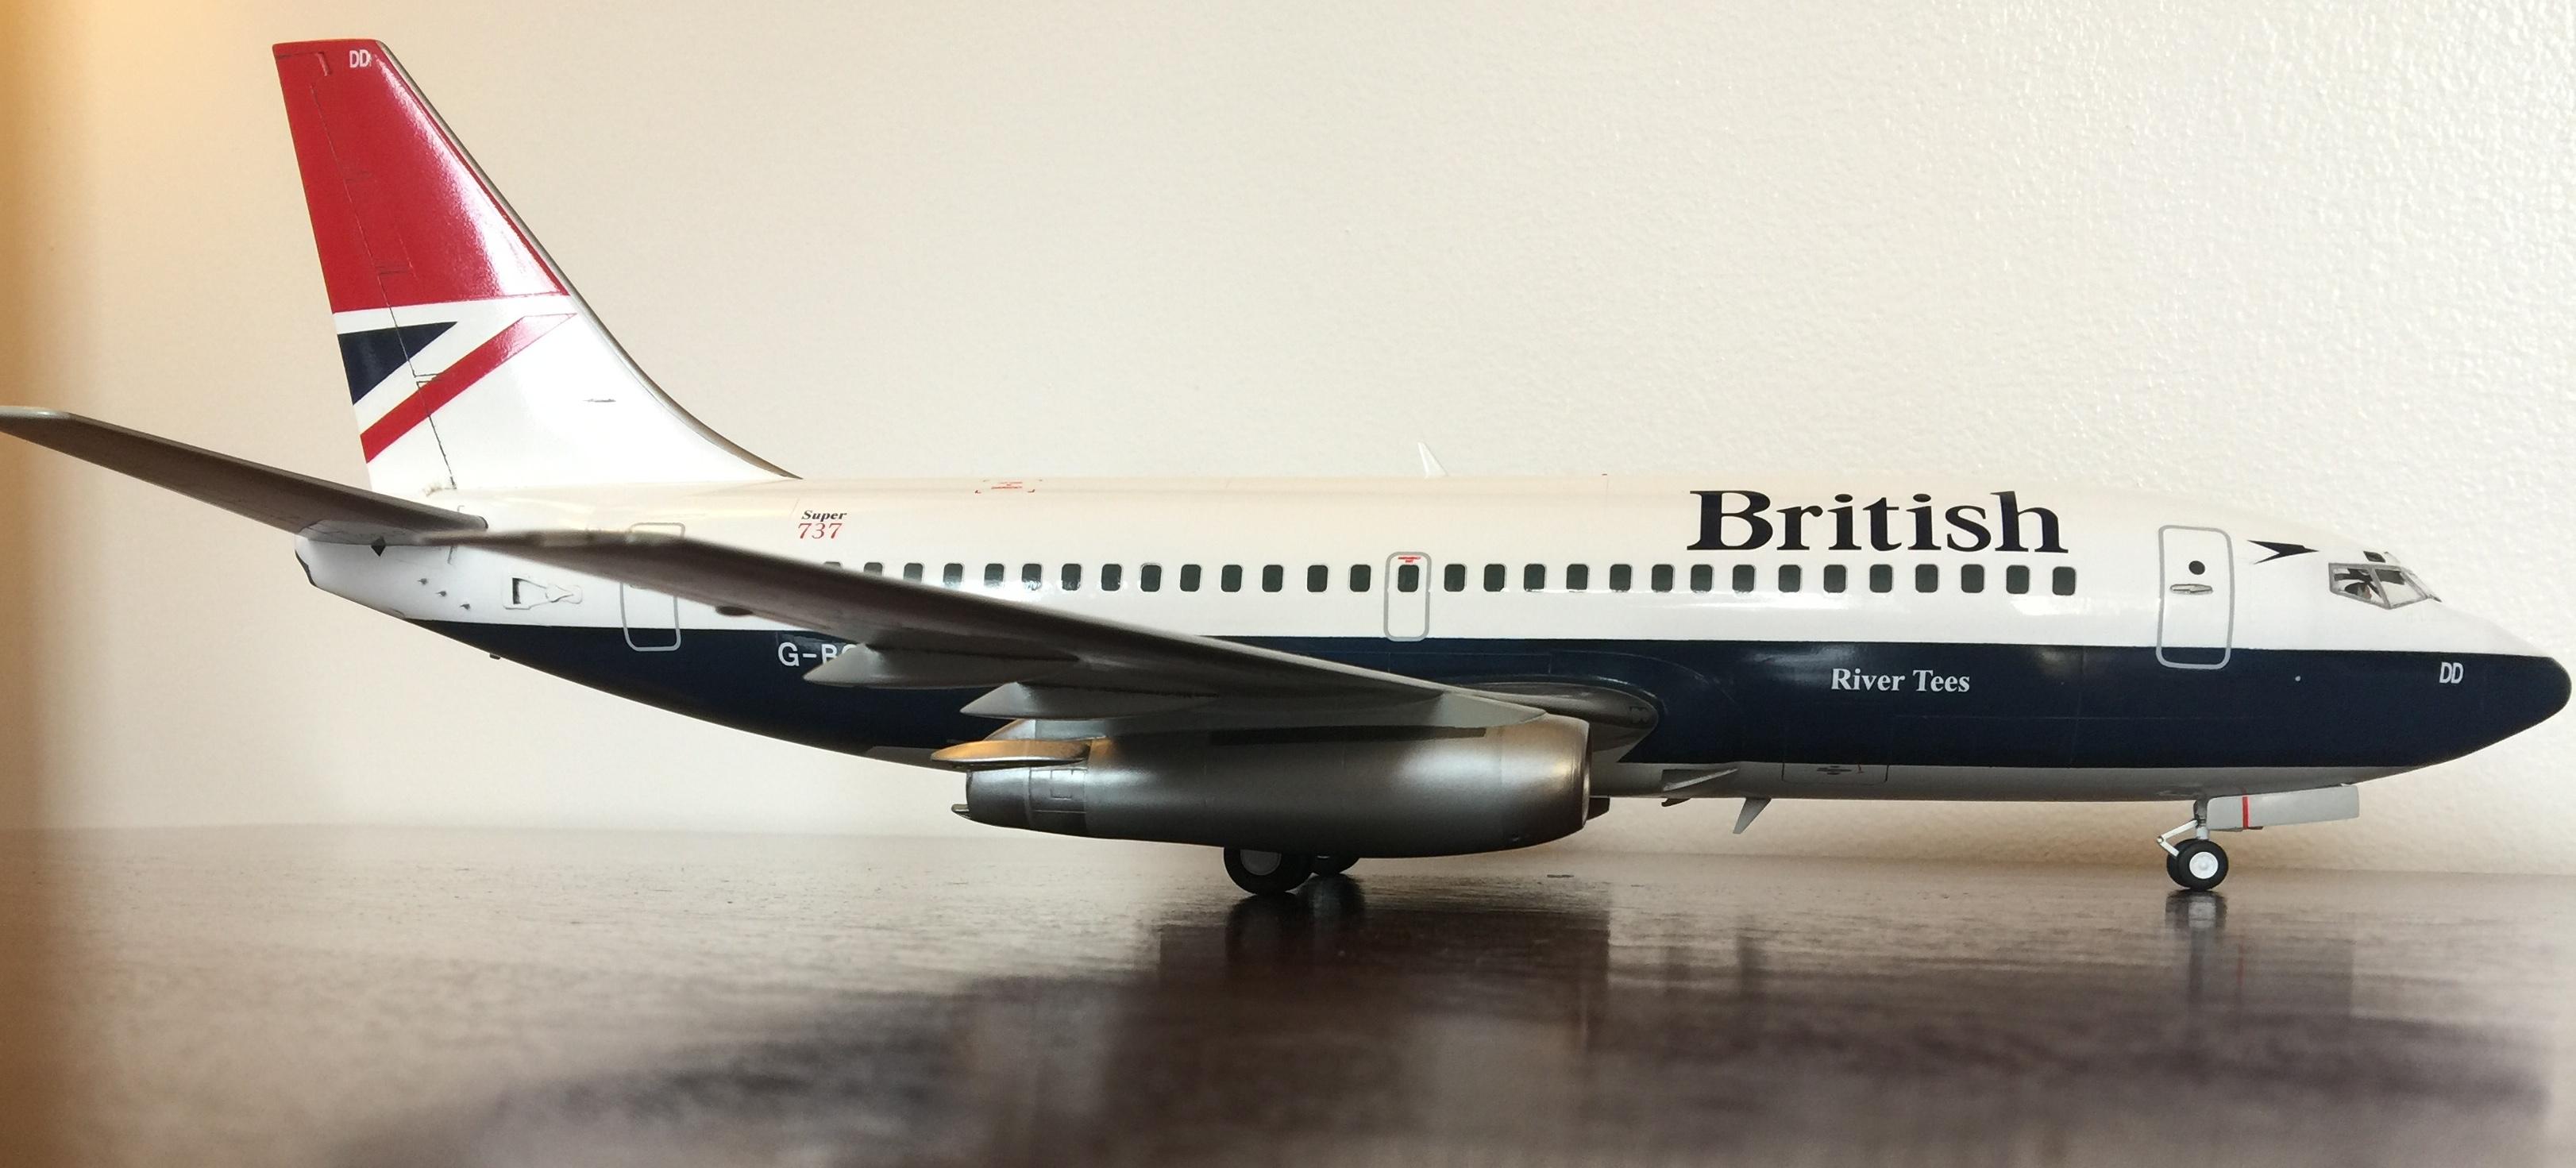 737-stbd-side